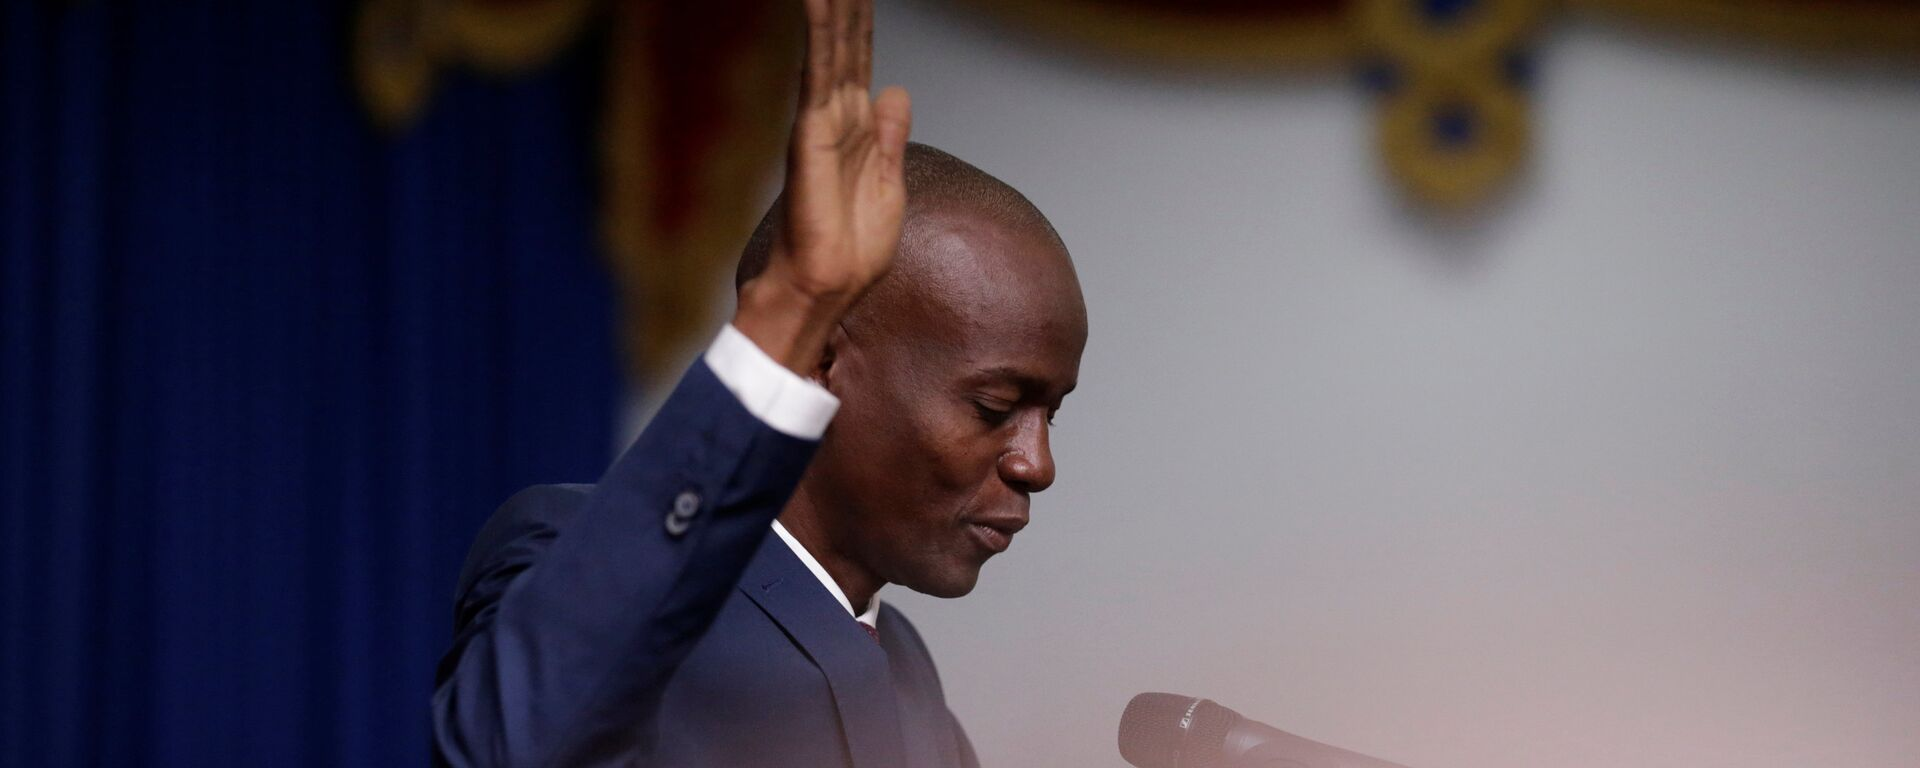 Haitian President Jovenel Moise takes the oath of office during his inauguration in Port-au-Prince, Haiti February 7, 2017 - Sputnik Mundo, 1920, 20.07.2021